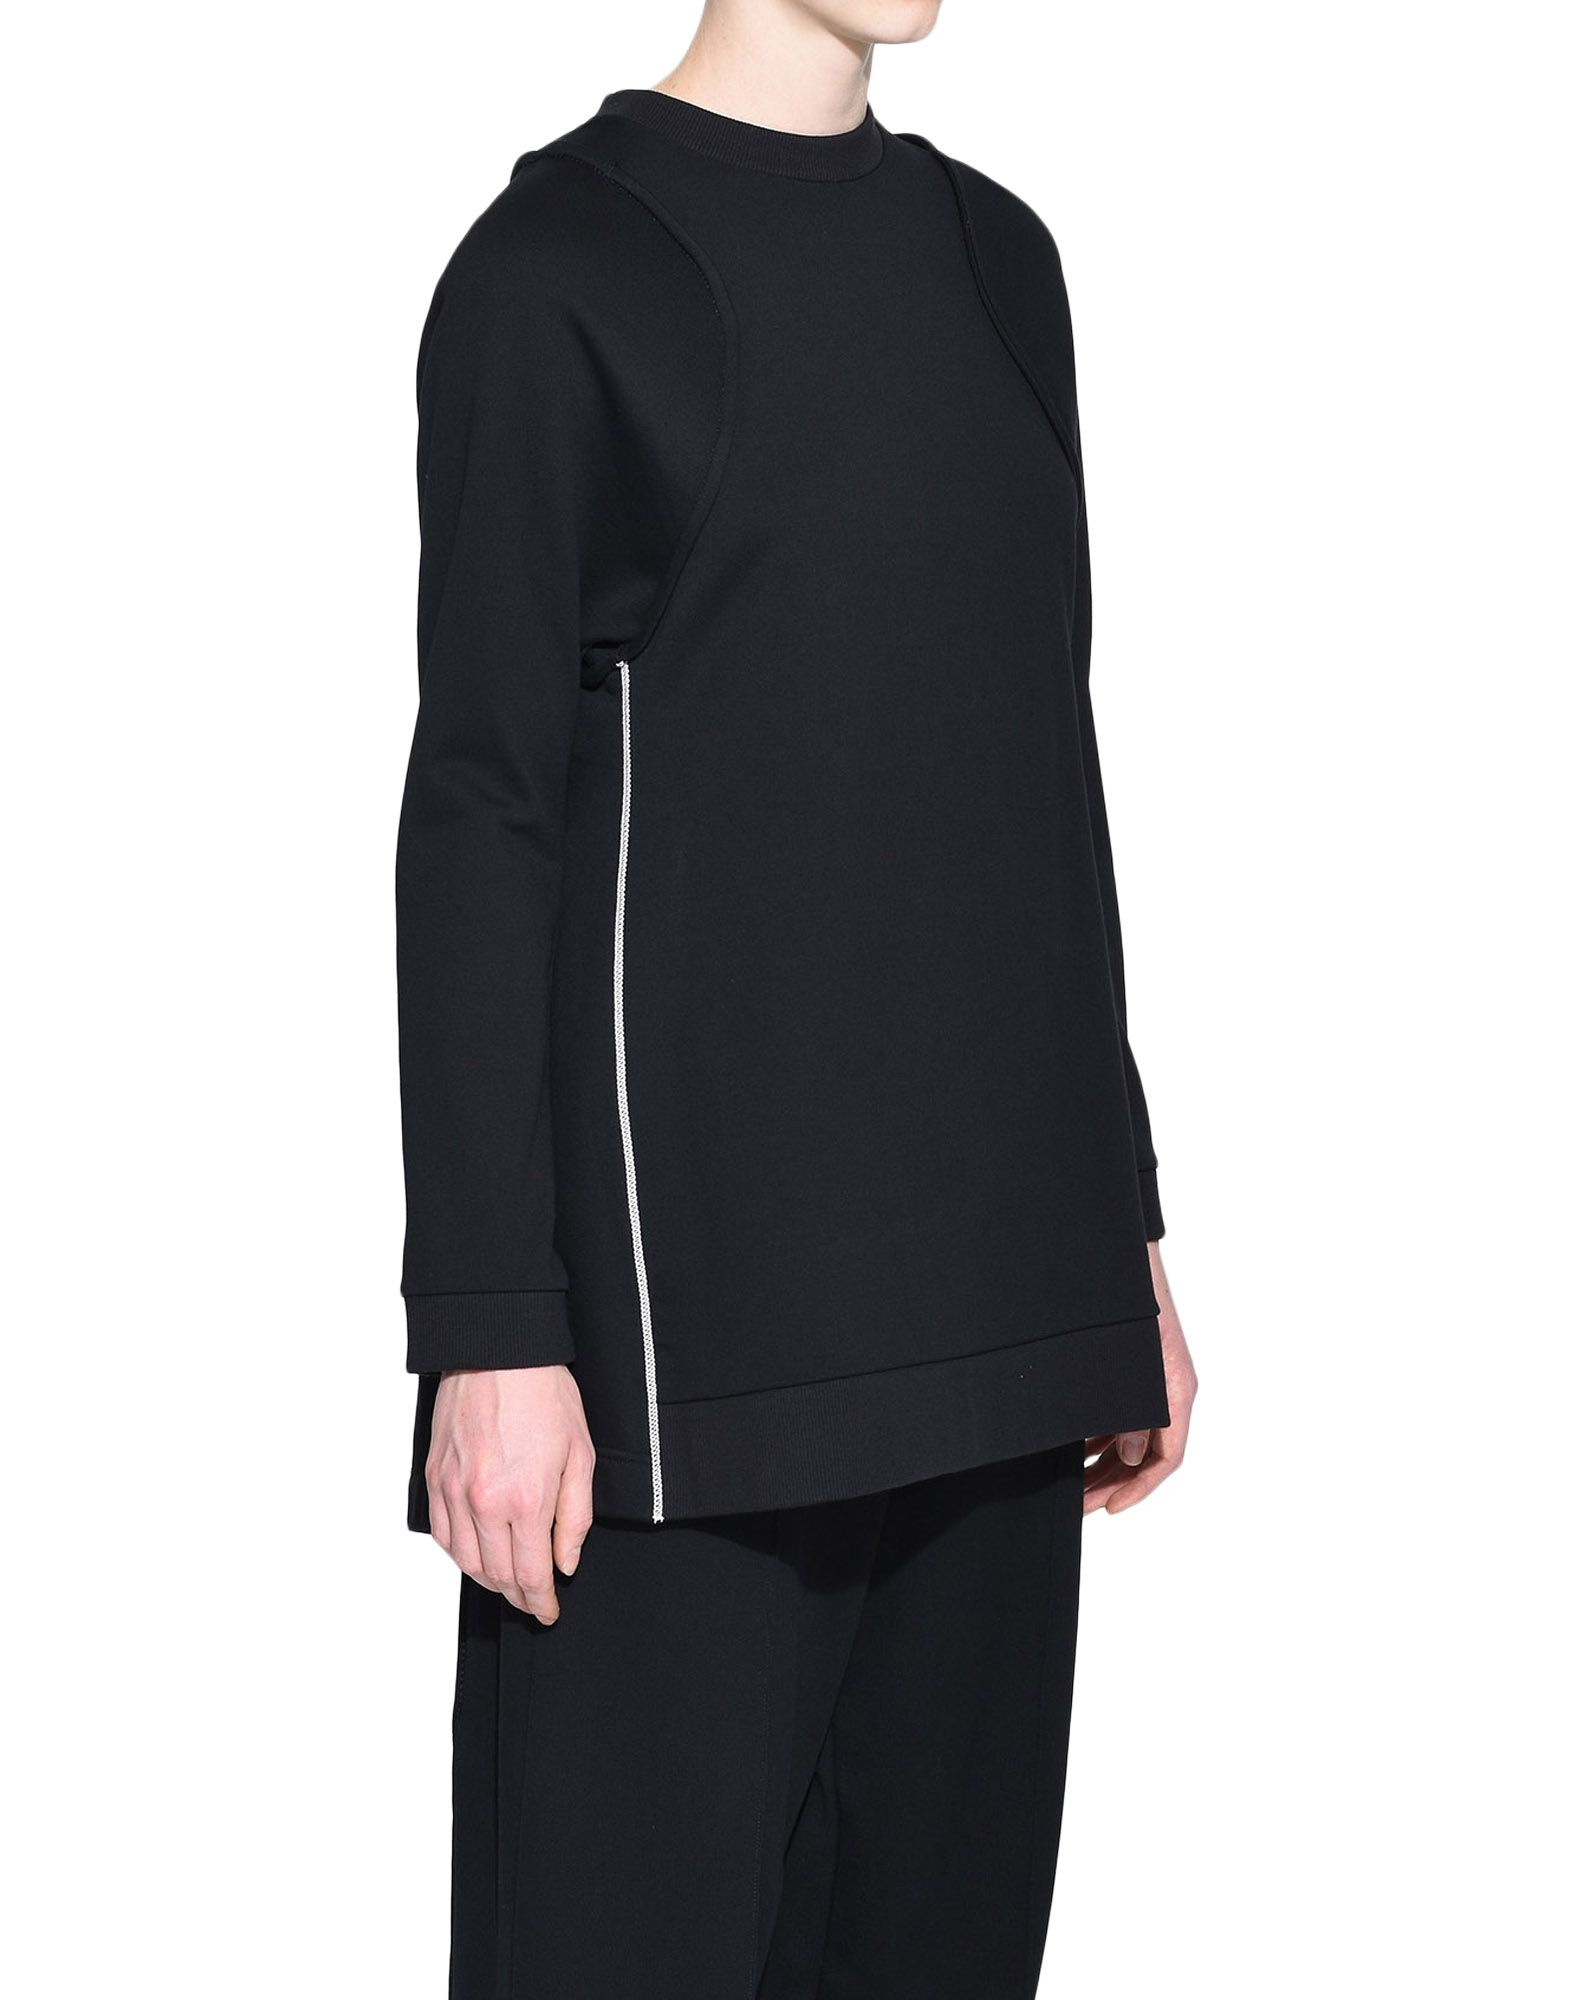 Y-3 Y-3 Sashiko Sweater Sweatshirt Woman e